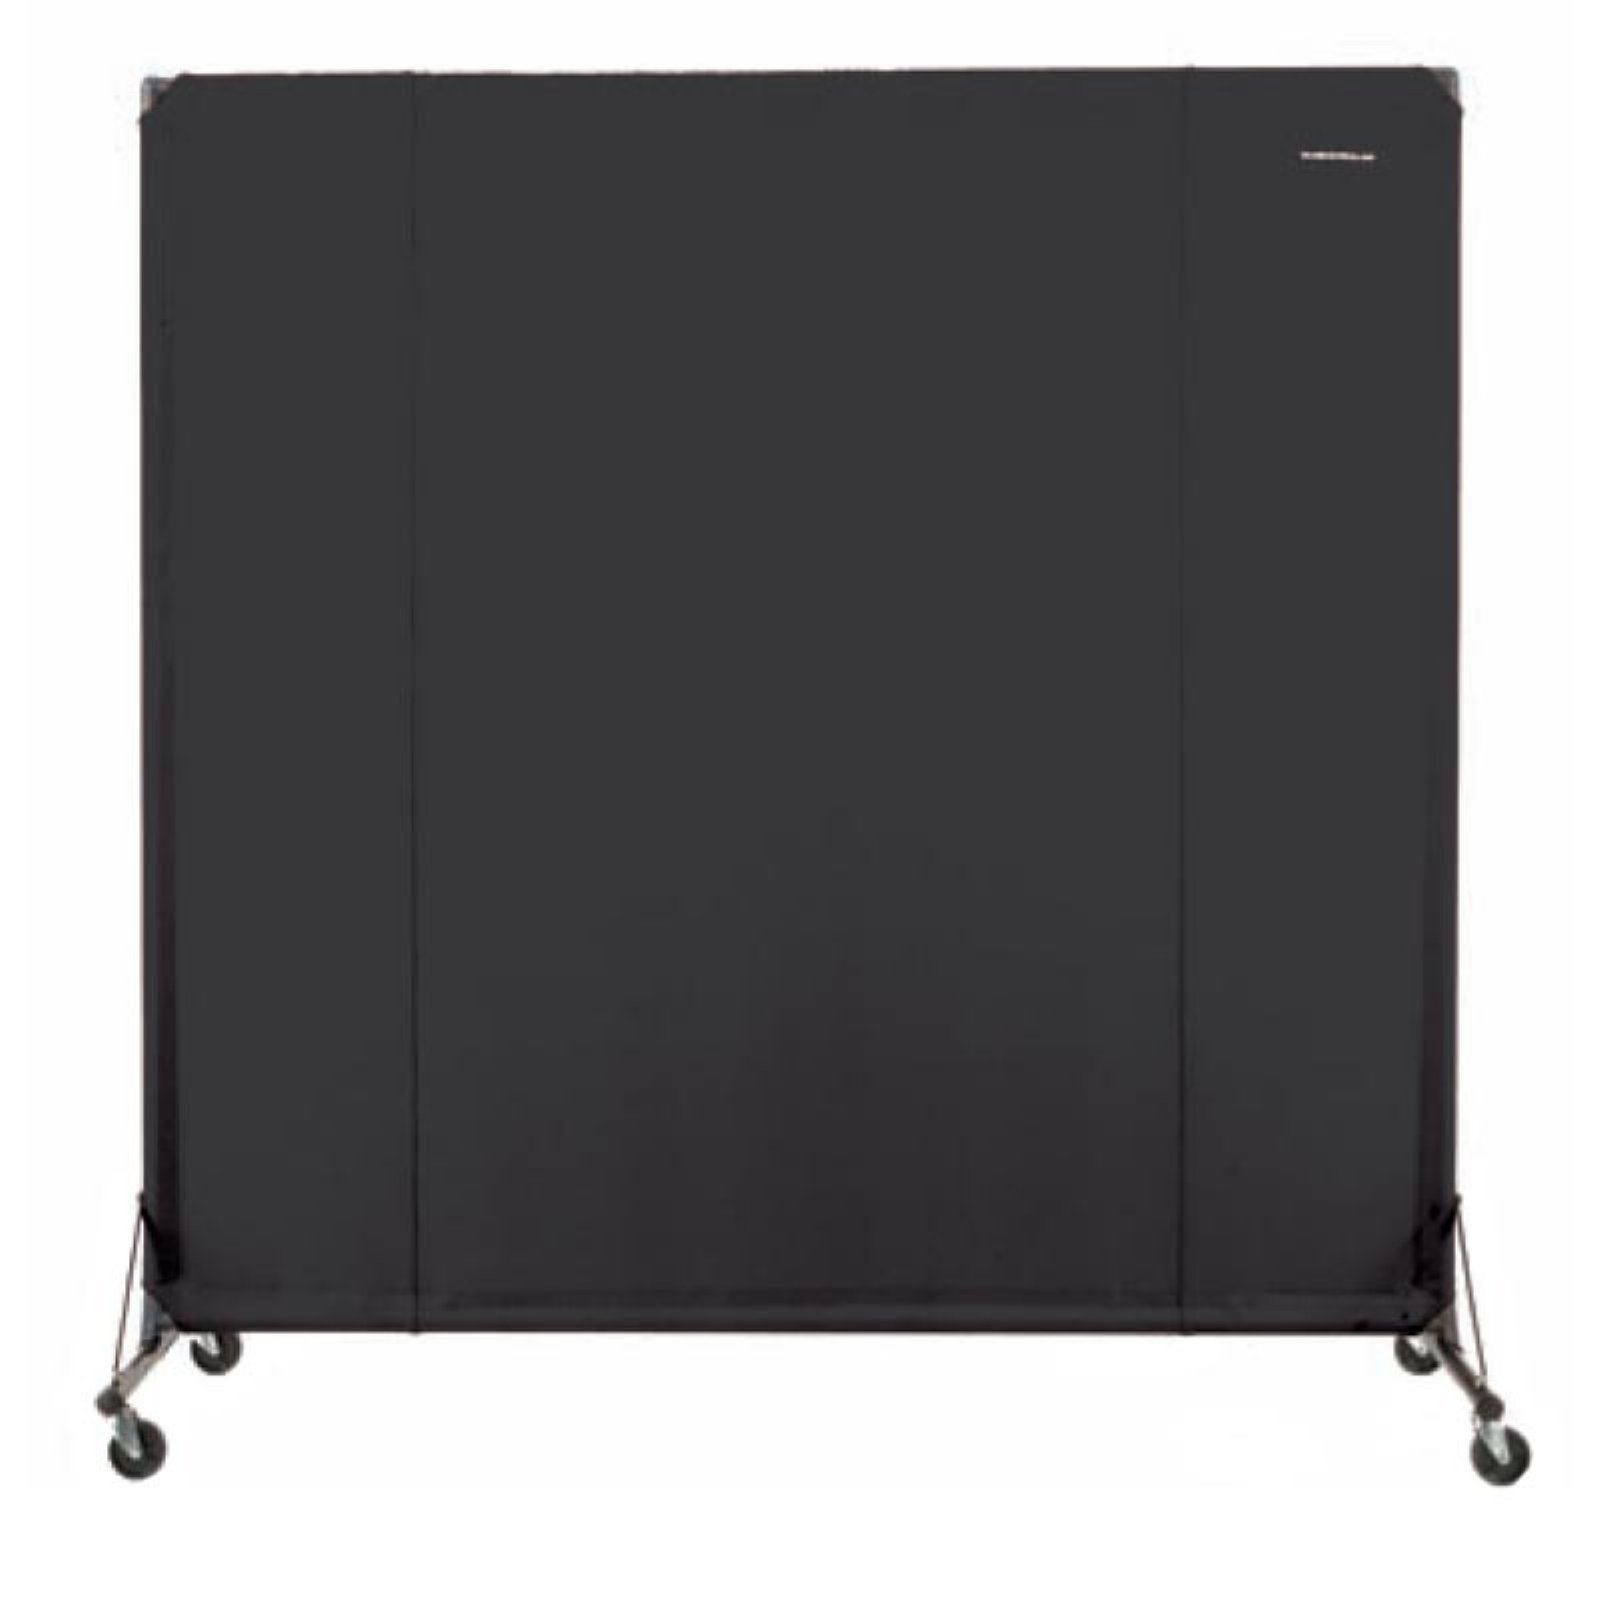 Versare VP6 Mobile Room Divider 360 - 6W x 6H ft.